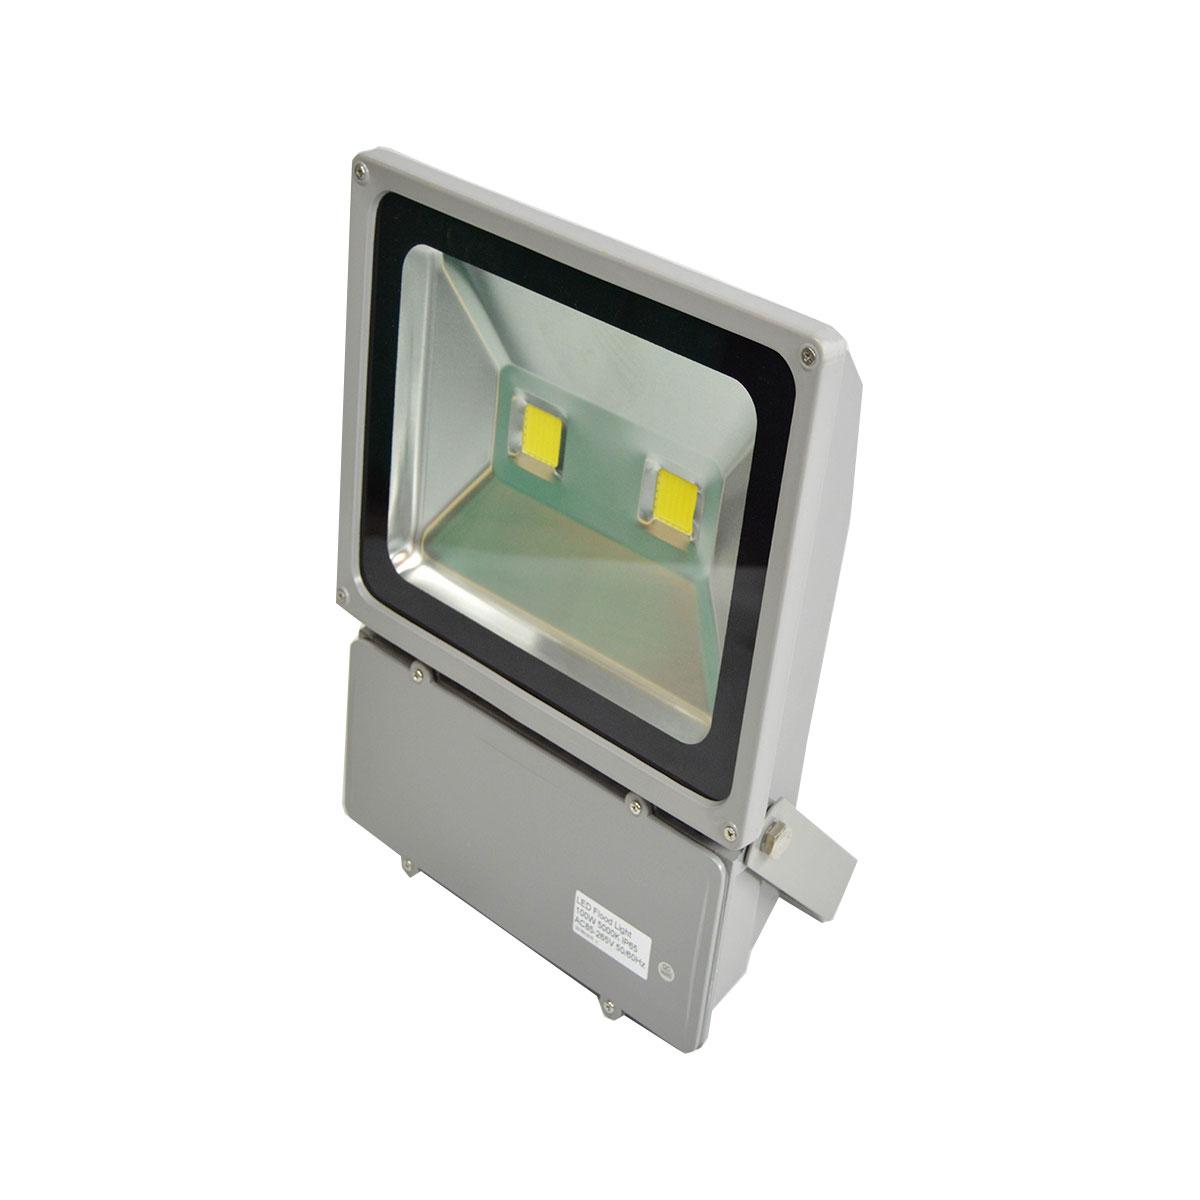 led floodlight 100 watt evergrid solar. Black Bedroom Furniture Sets. Home Design Ideas